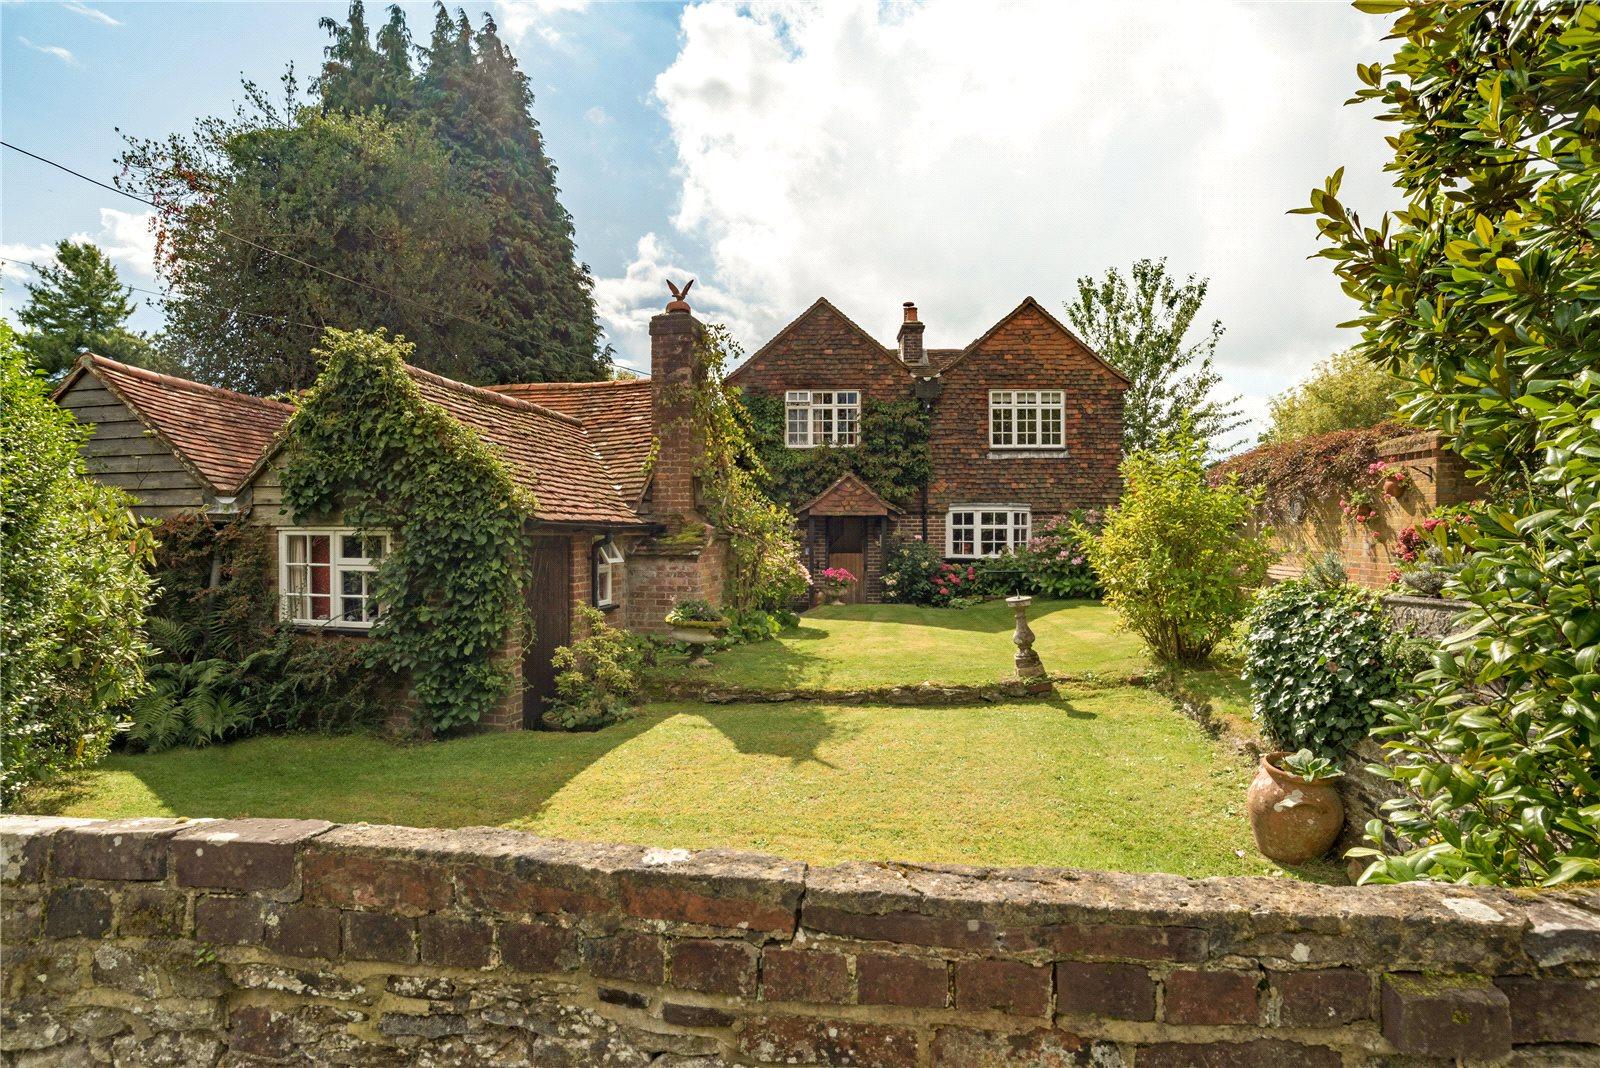 Частный дом для того Продажа на Dye House Road, Thursley, Godalming, Surrey, GU8 Godalming, Англия